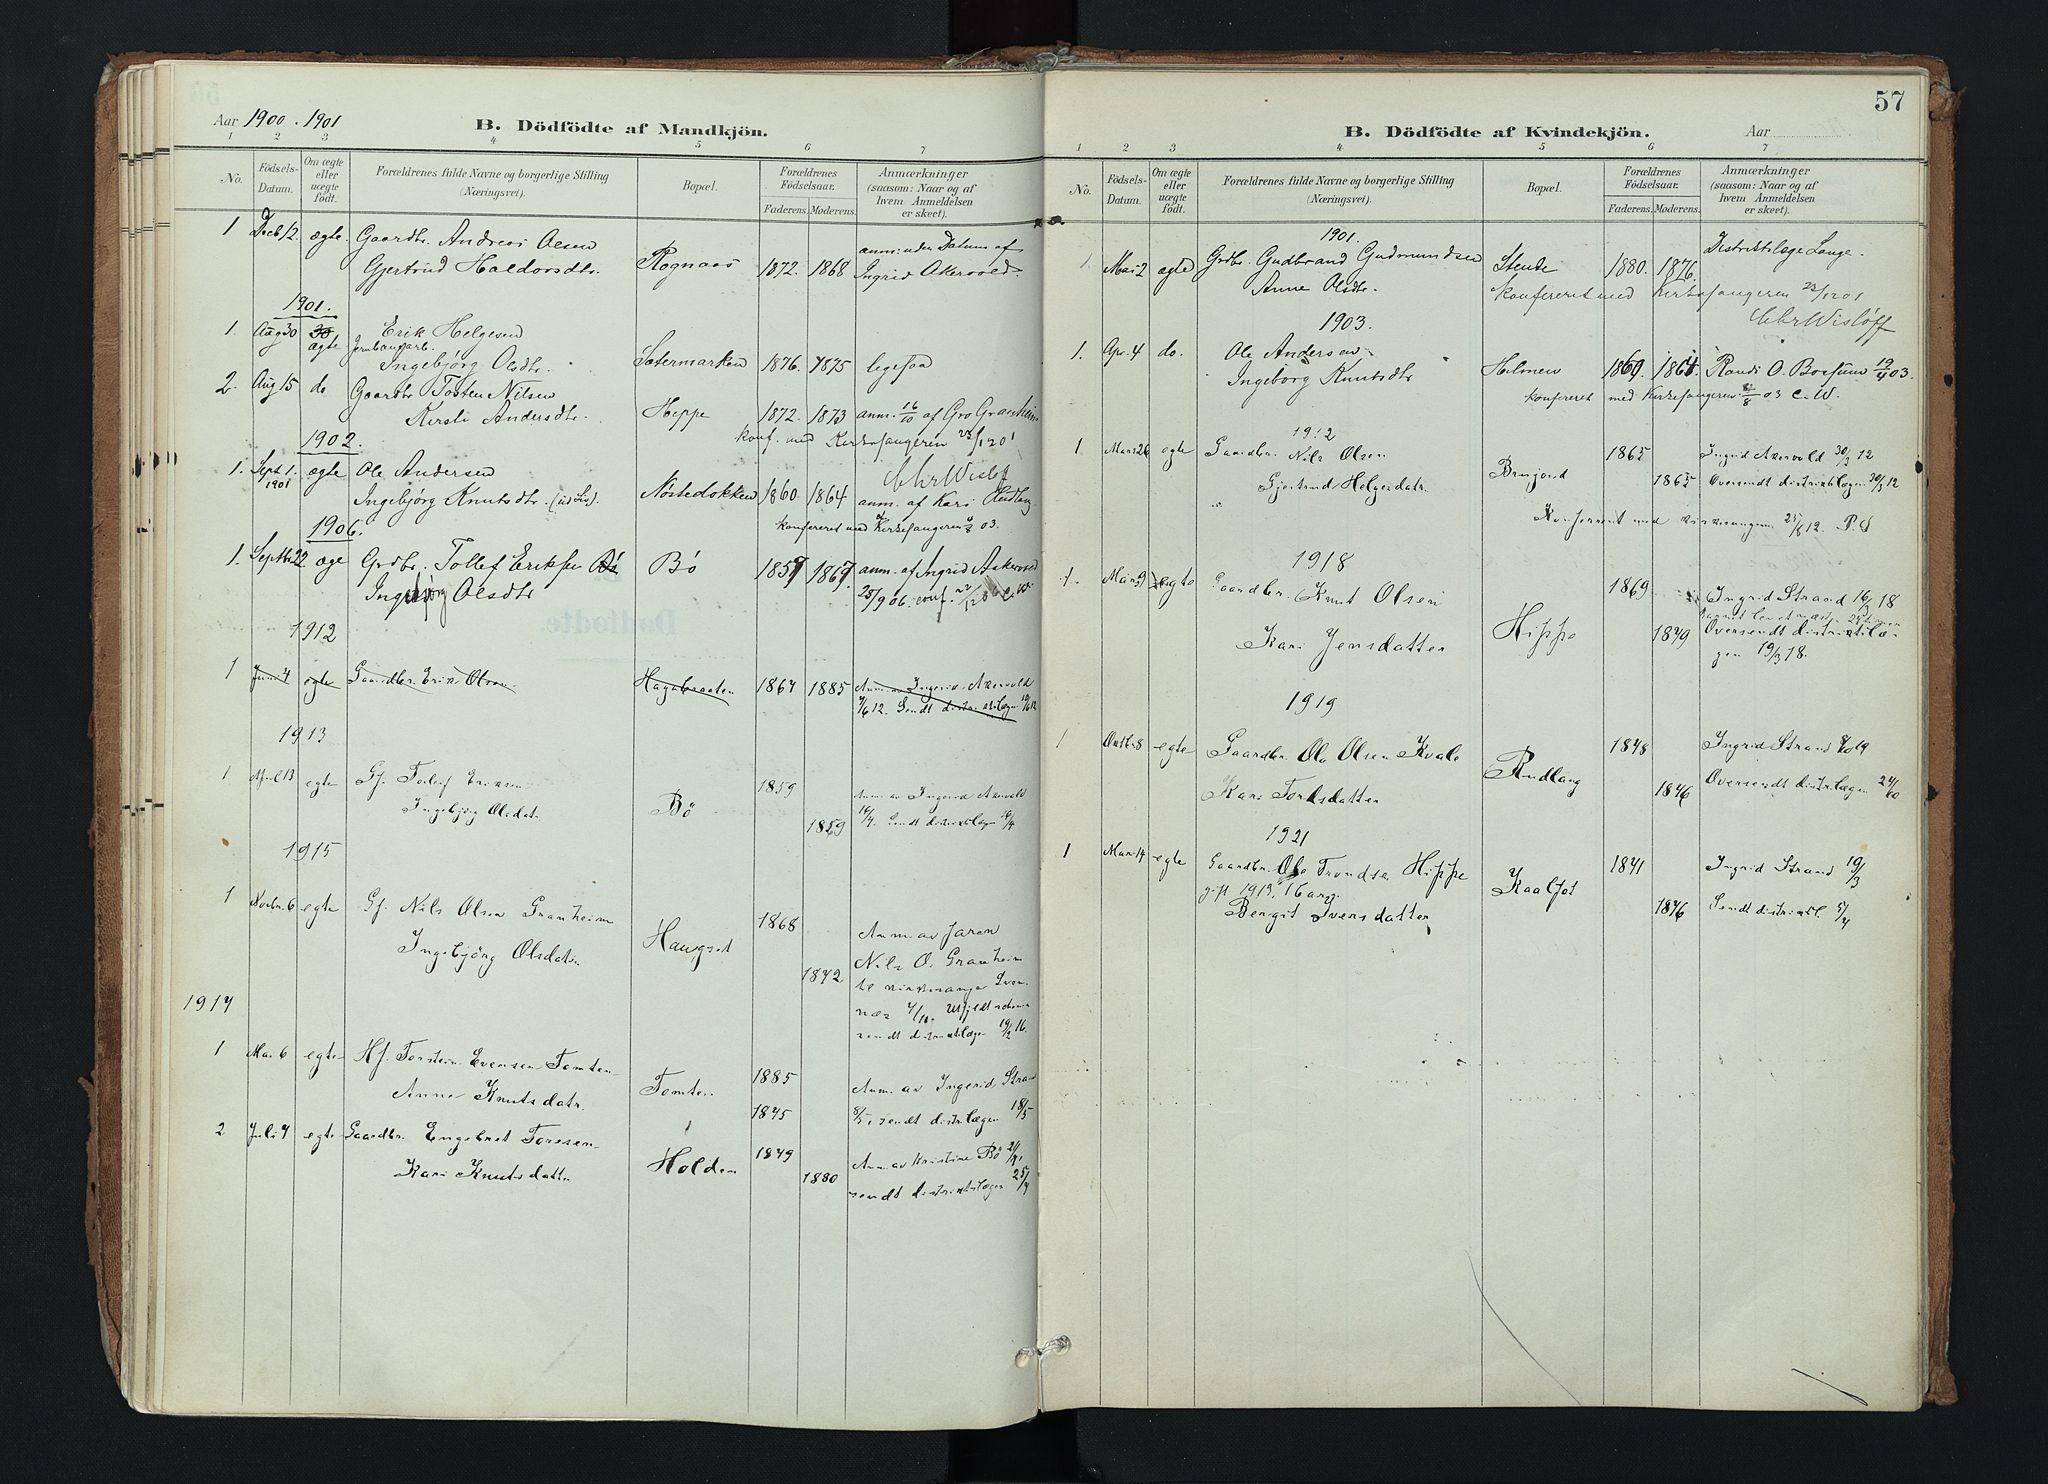 SAH, Nord-Aurdal prestekontor, Ministerialbok nr. 17, 1897-1926, s. 57